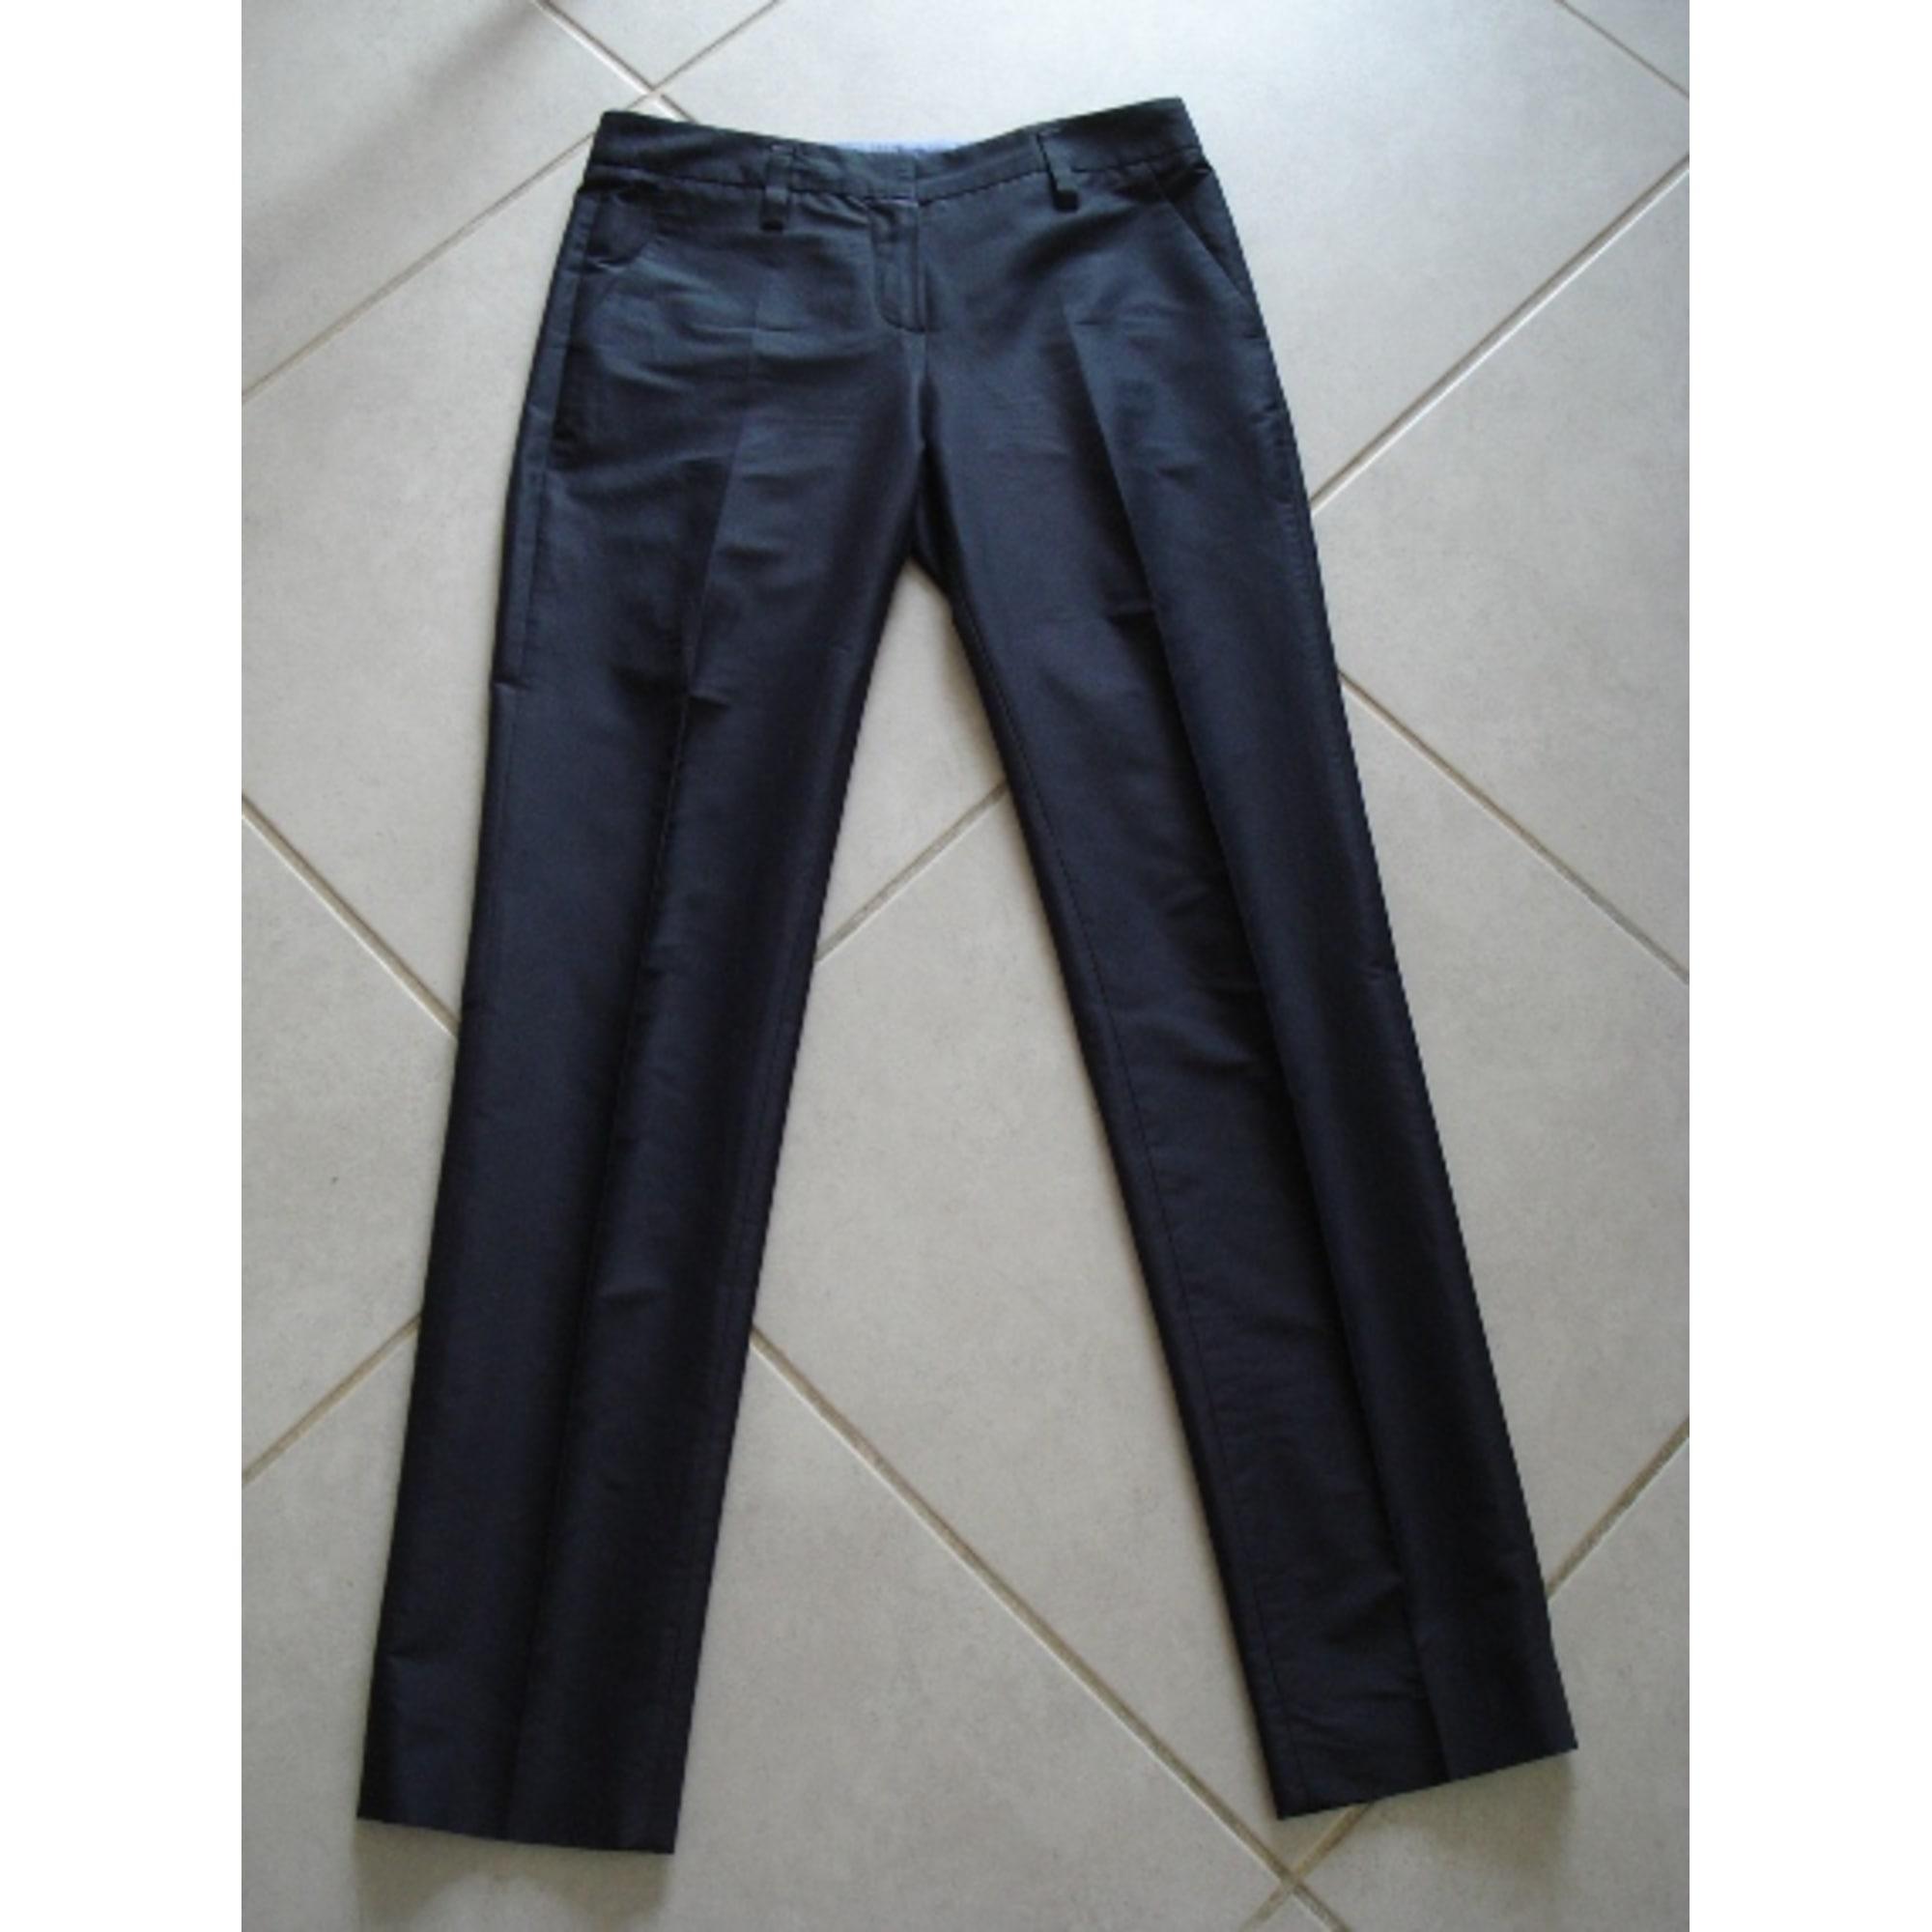 Pantalon droit SONIA BY SONIA RYKIEL Noir